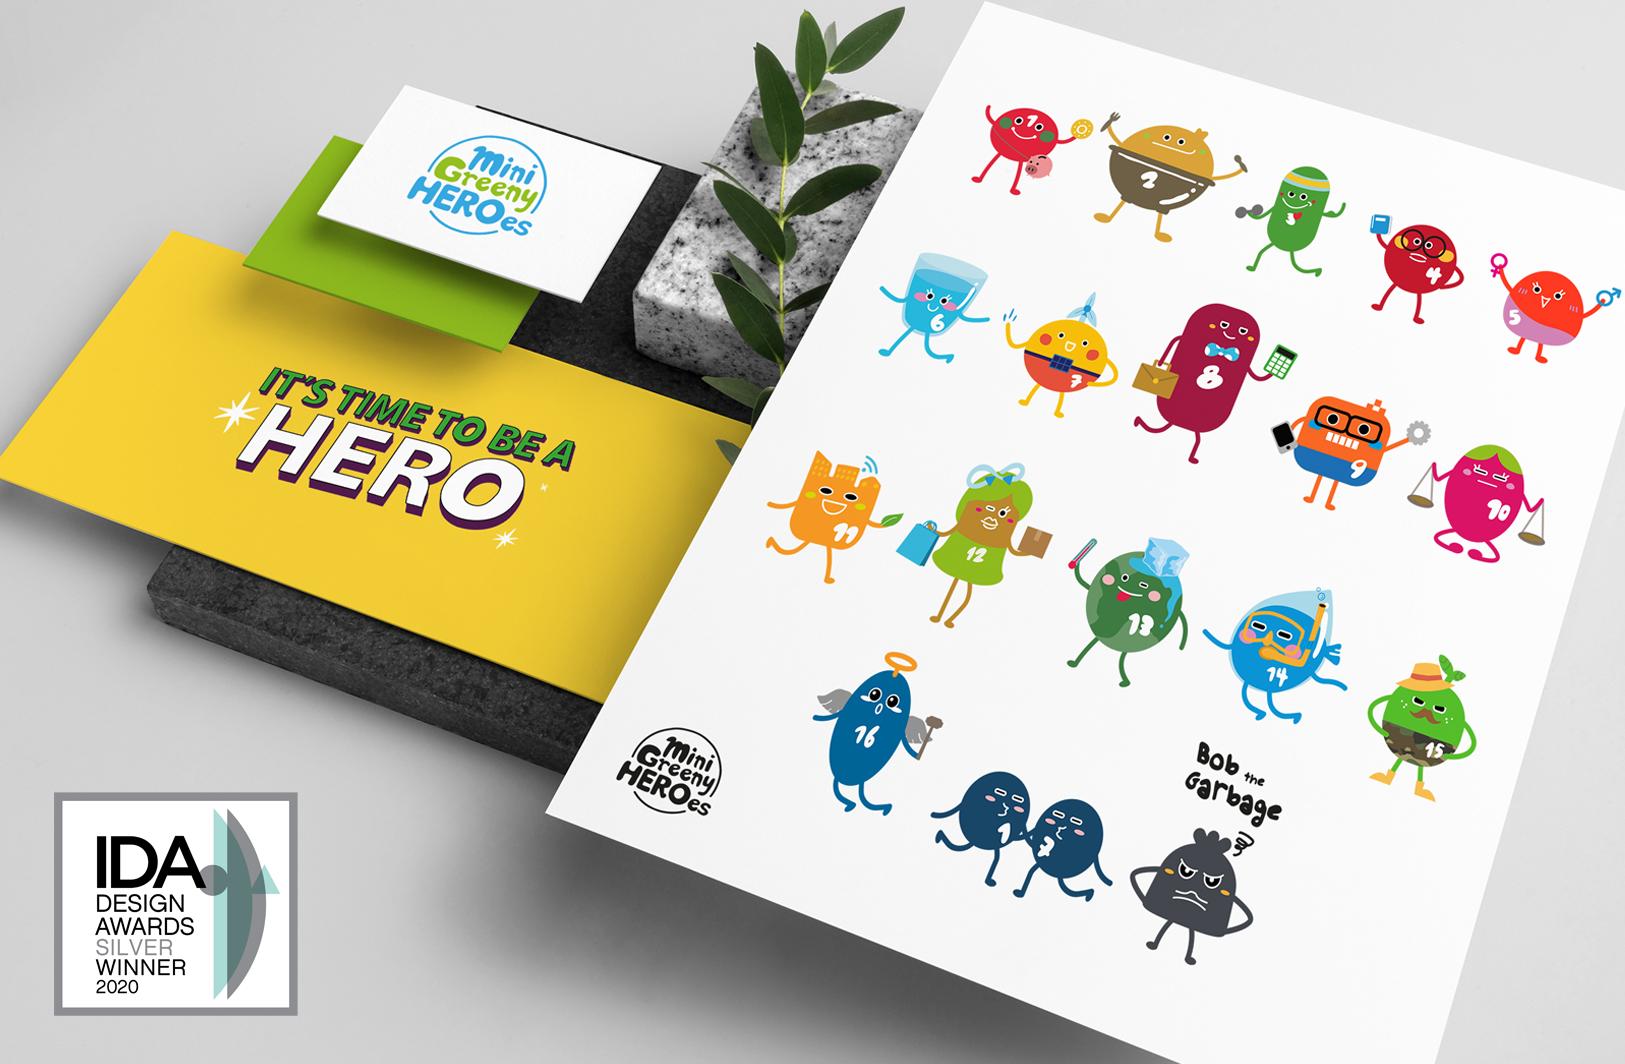 The Mini Greeny Heroes